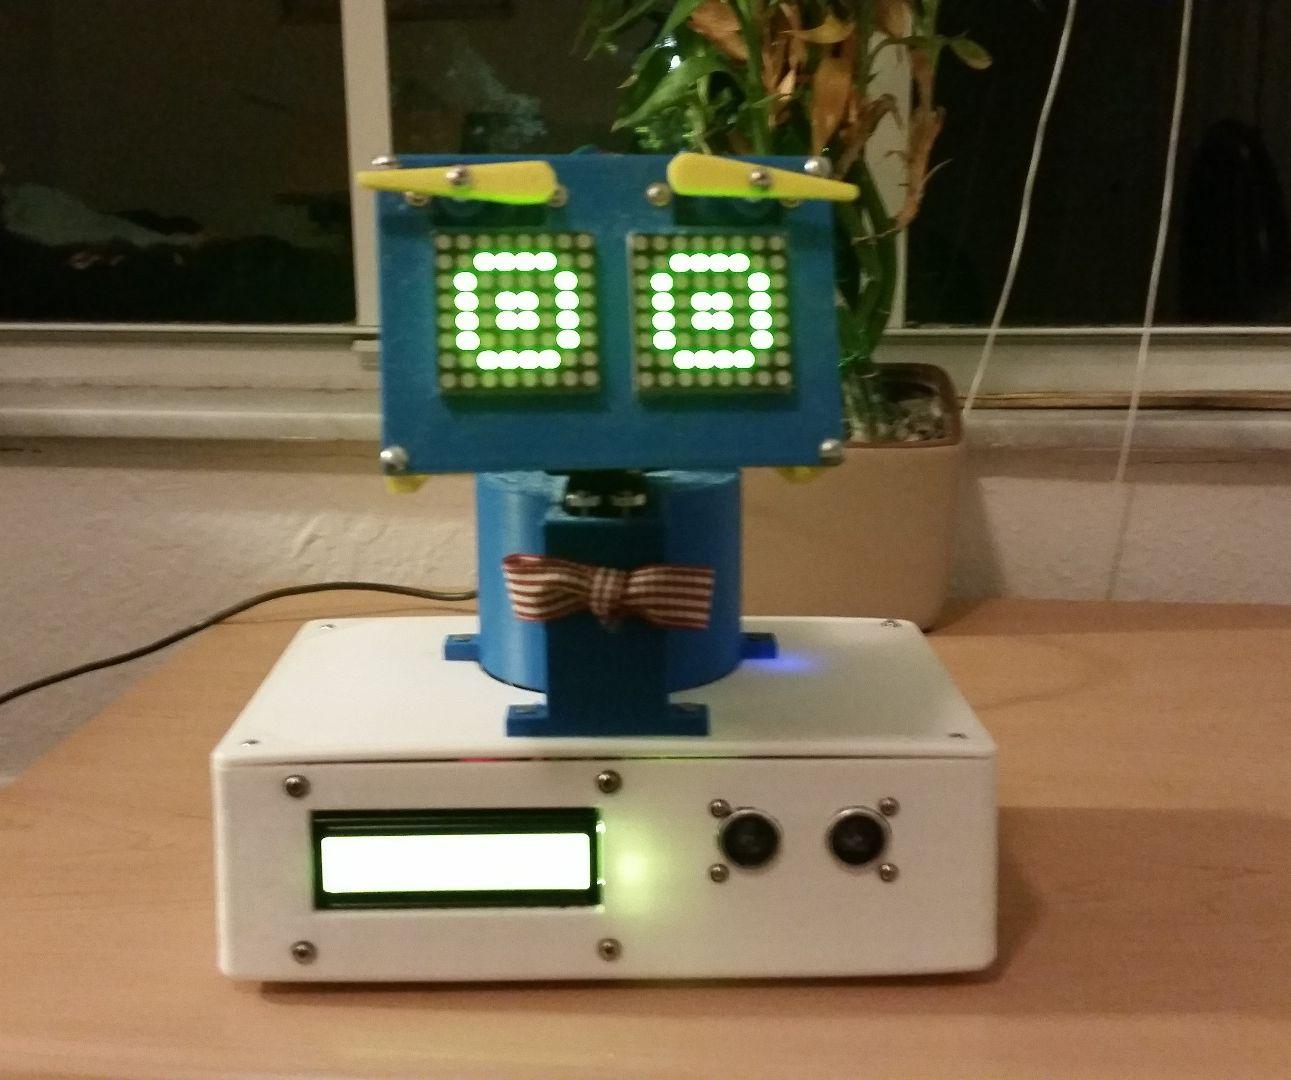 Brobot: The Emotionally Responsive Robot